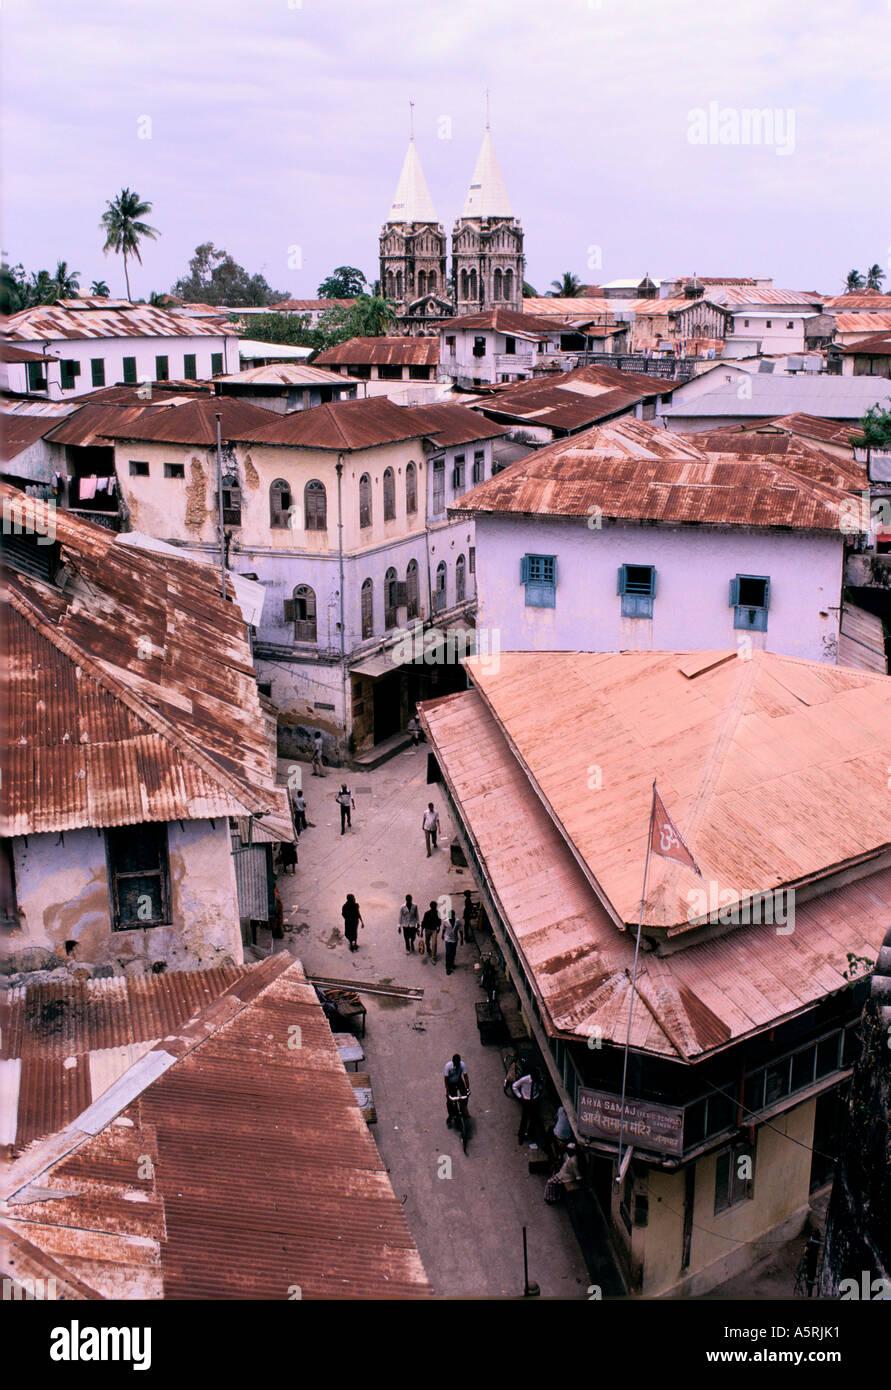 zanzibar island buildings east africa stock photo 6499504 alamy